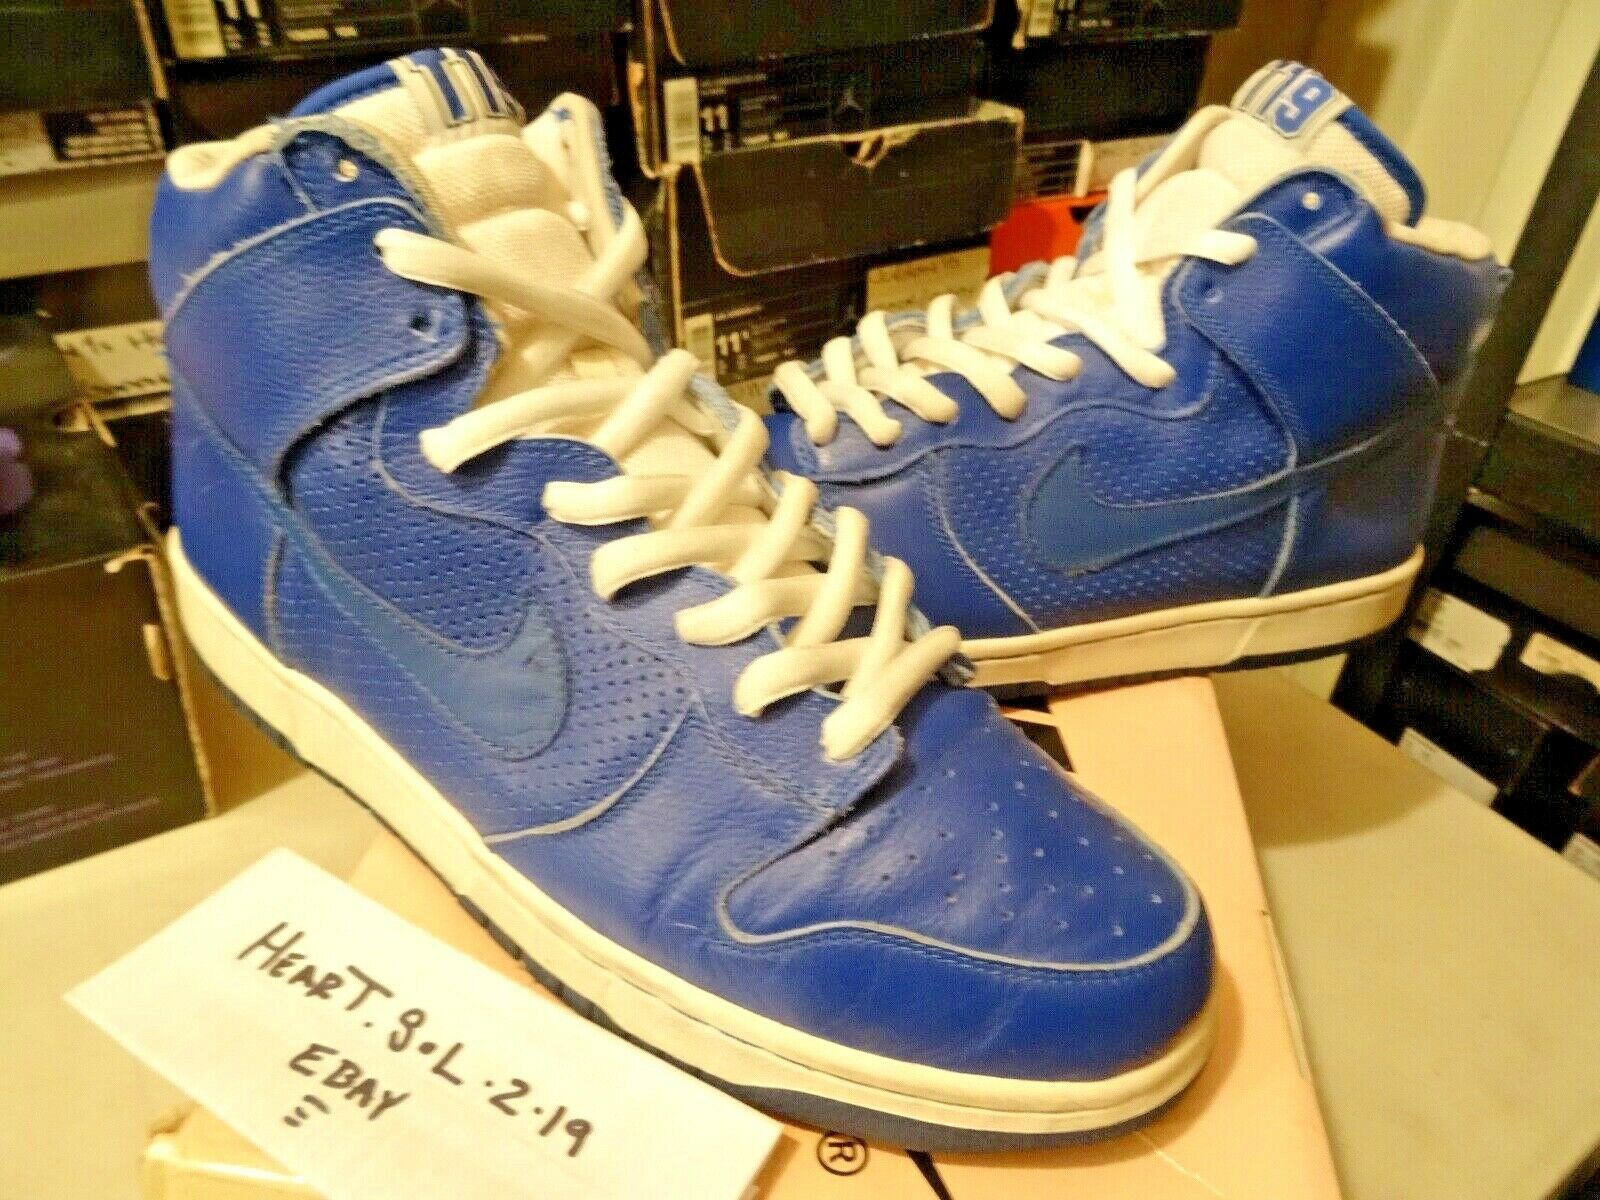 2005 NIKE DUNK HIGH PRO SB   T19 sport Royal bluee White   305050-441 SZ 13